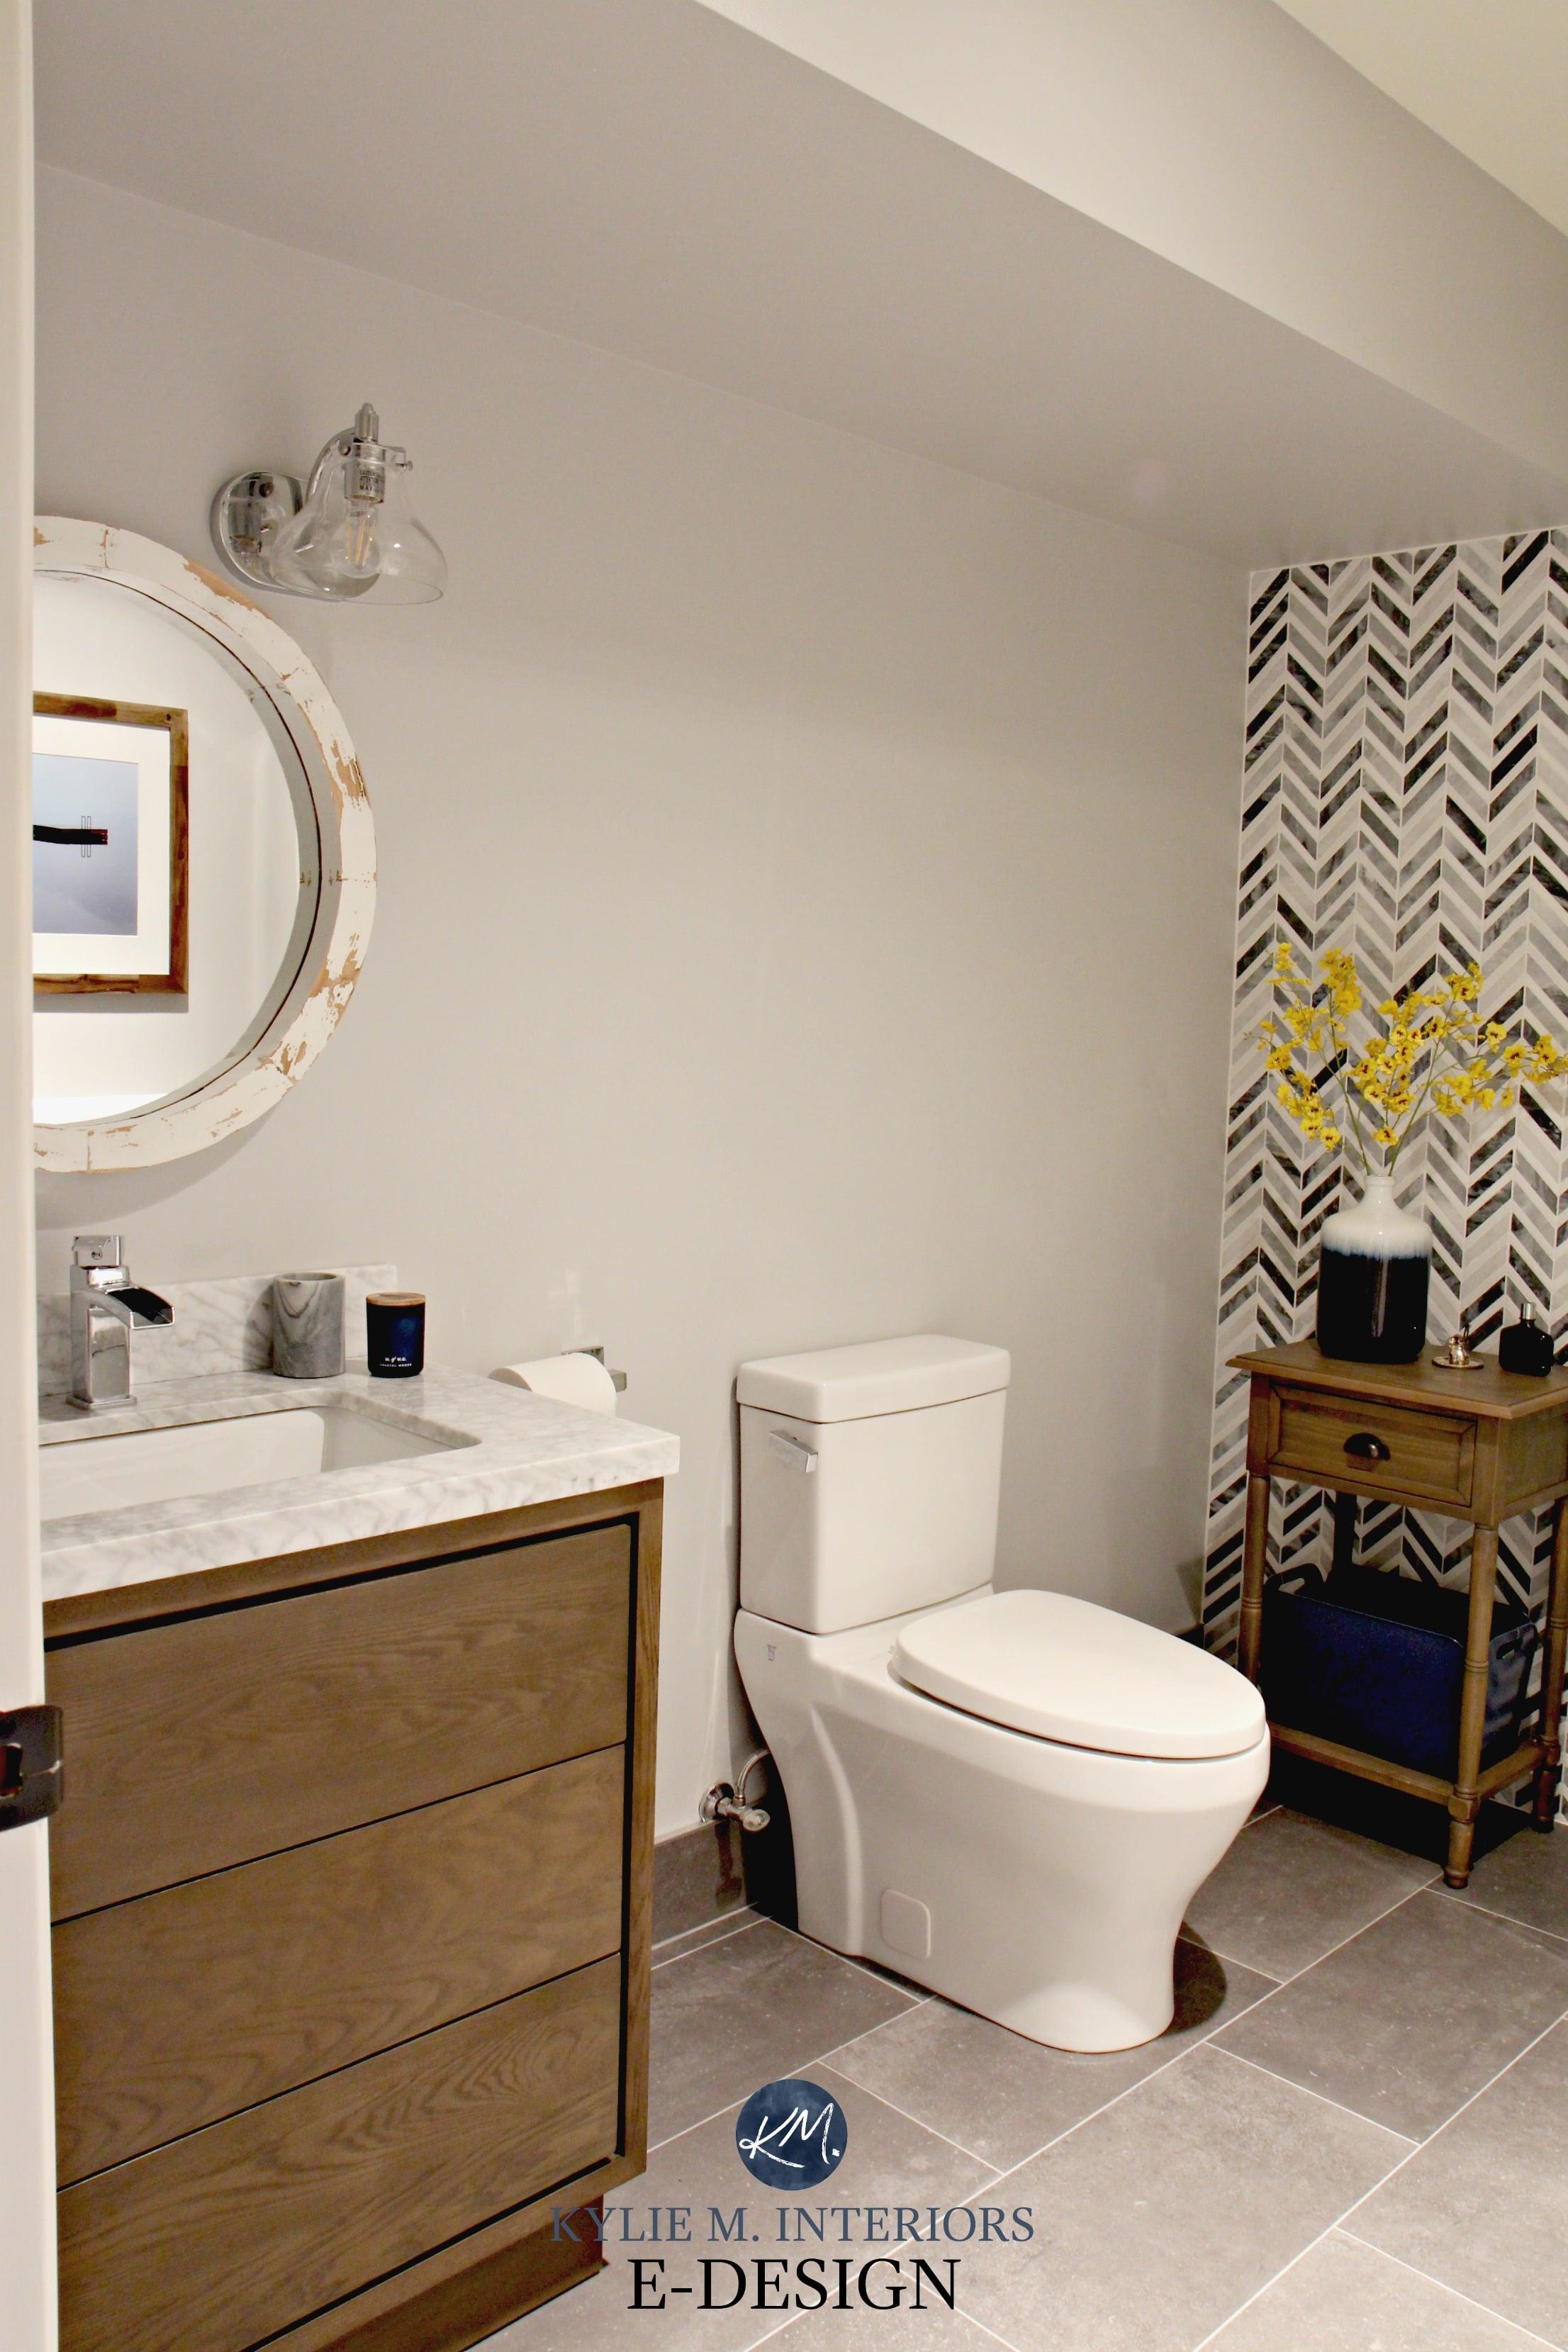 Ideas to add style to small bathroom. Herringbone marble